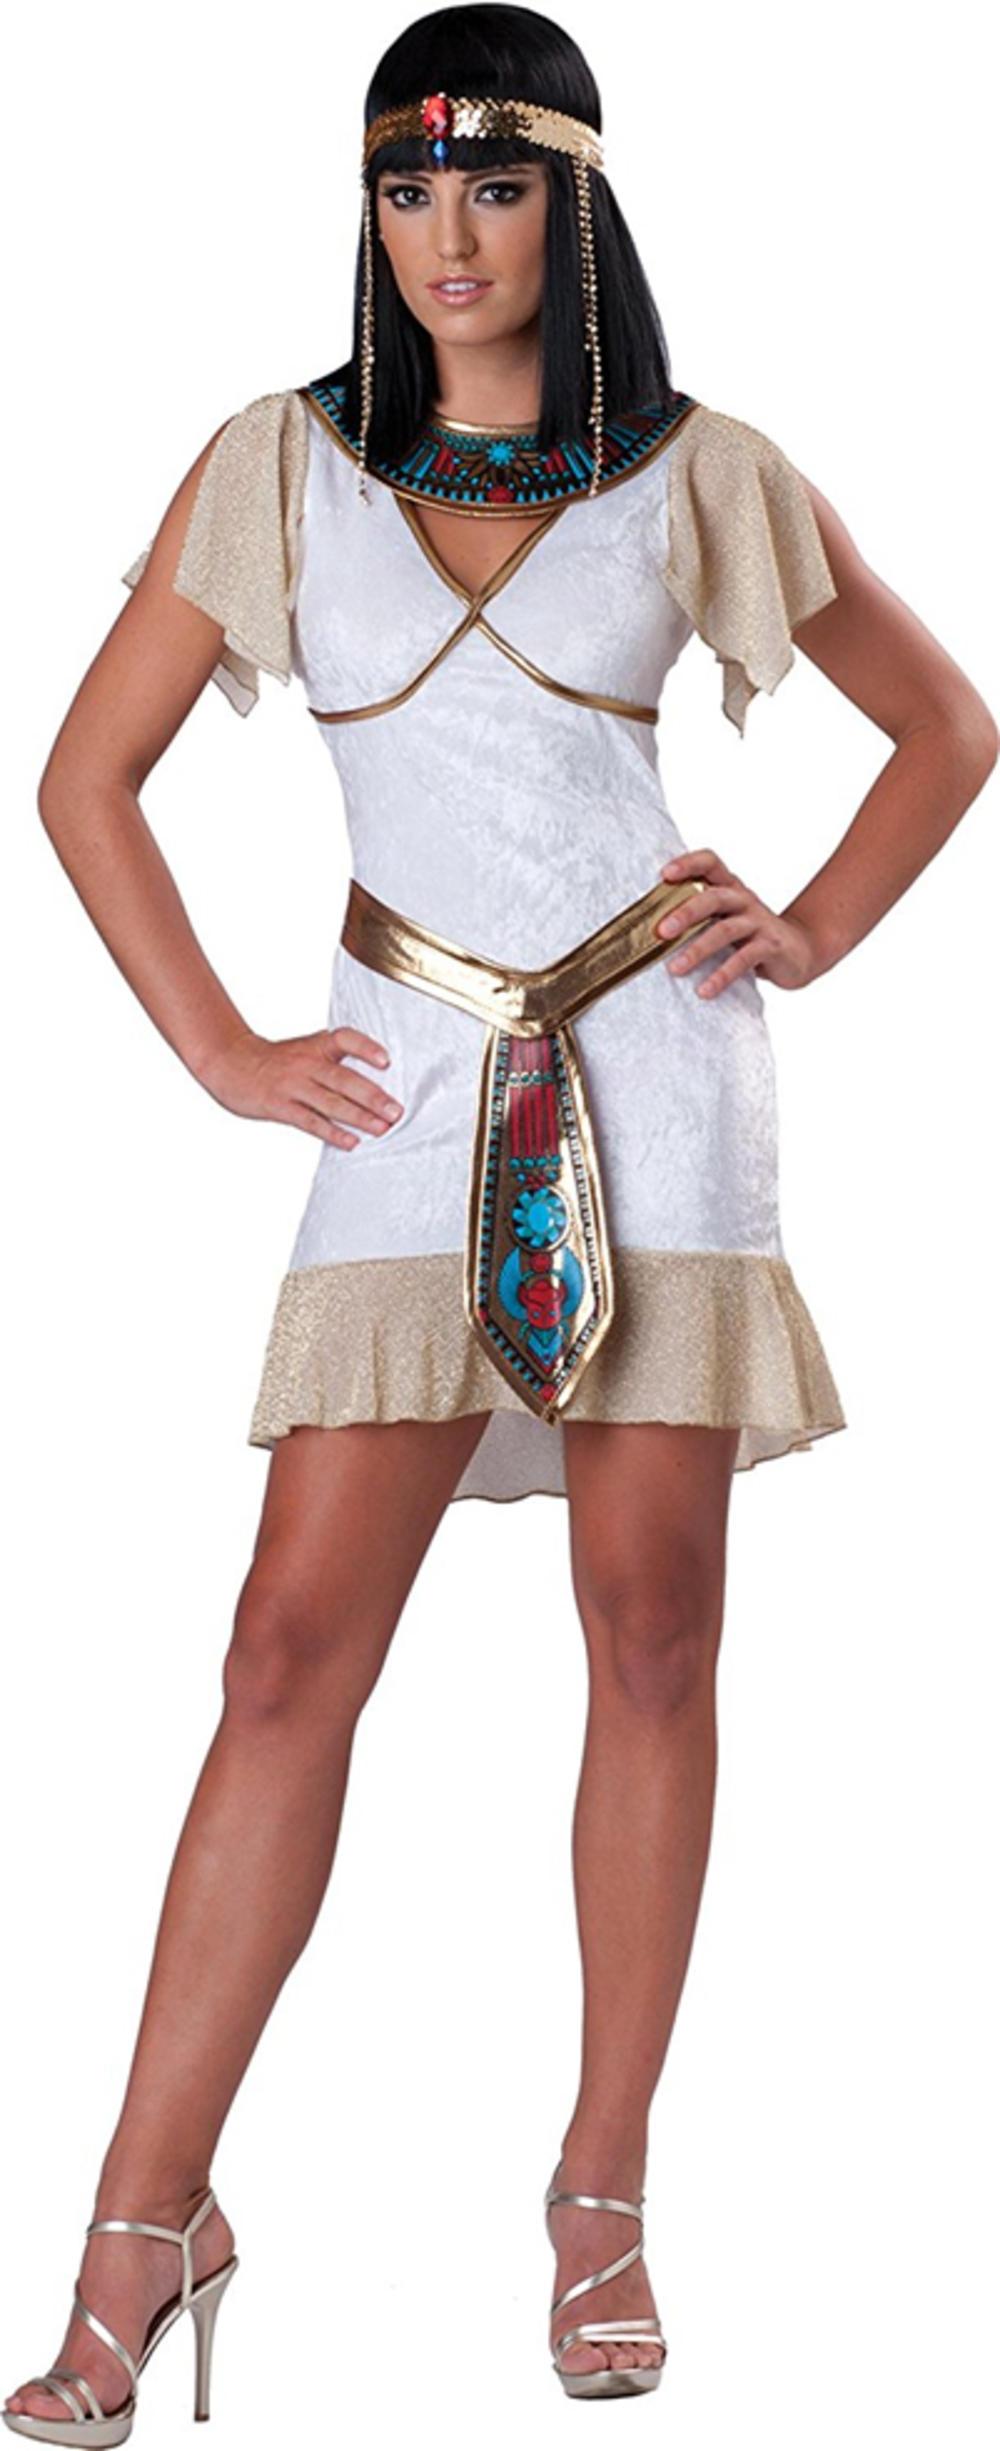 Egyptian Jewel Women's Costumes